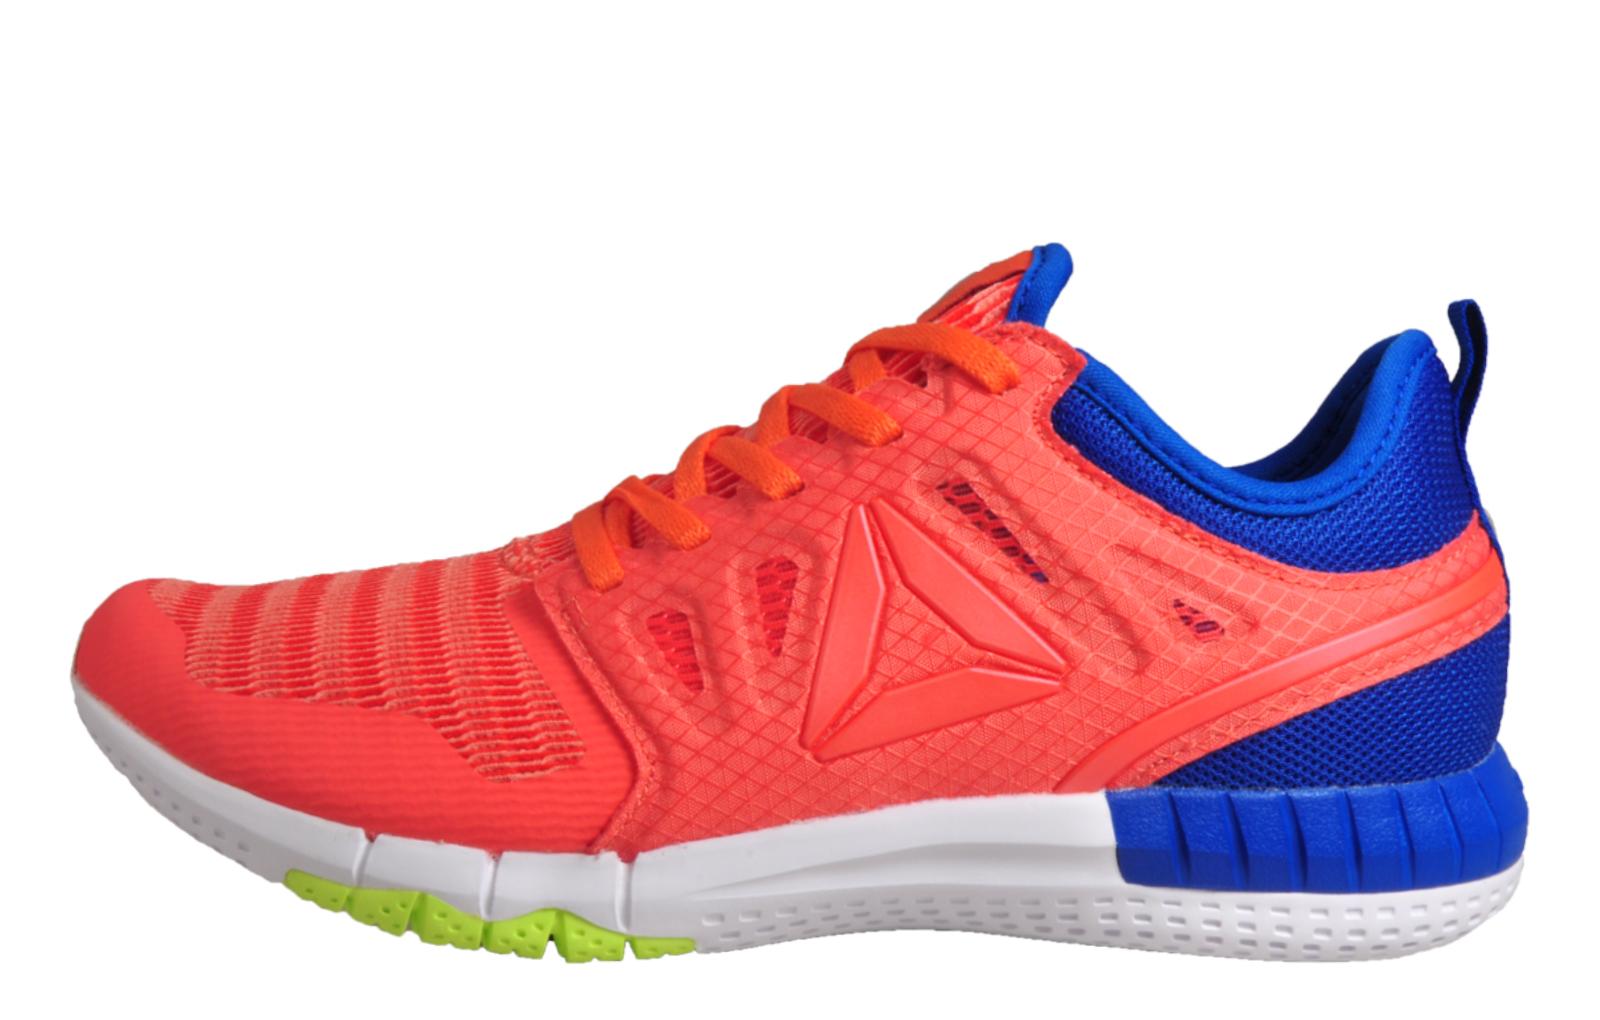 Reebok Women's Zprint 3D Running Shoe Choose SZColor | eBay